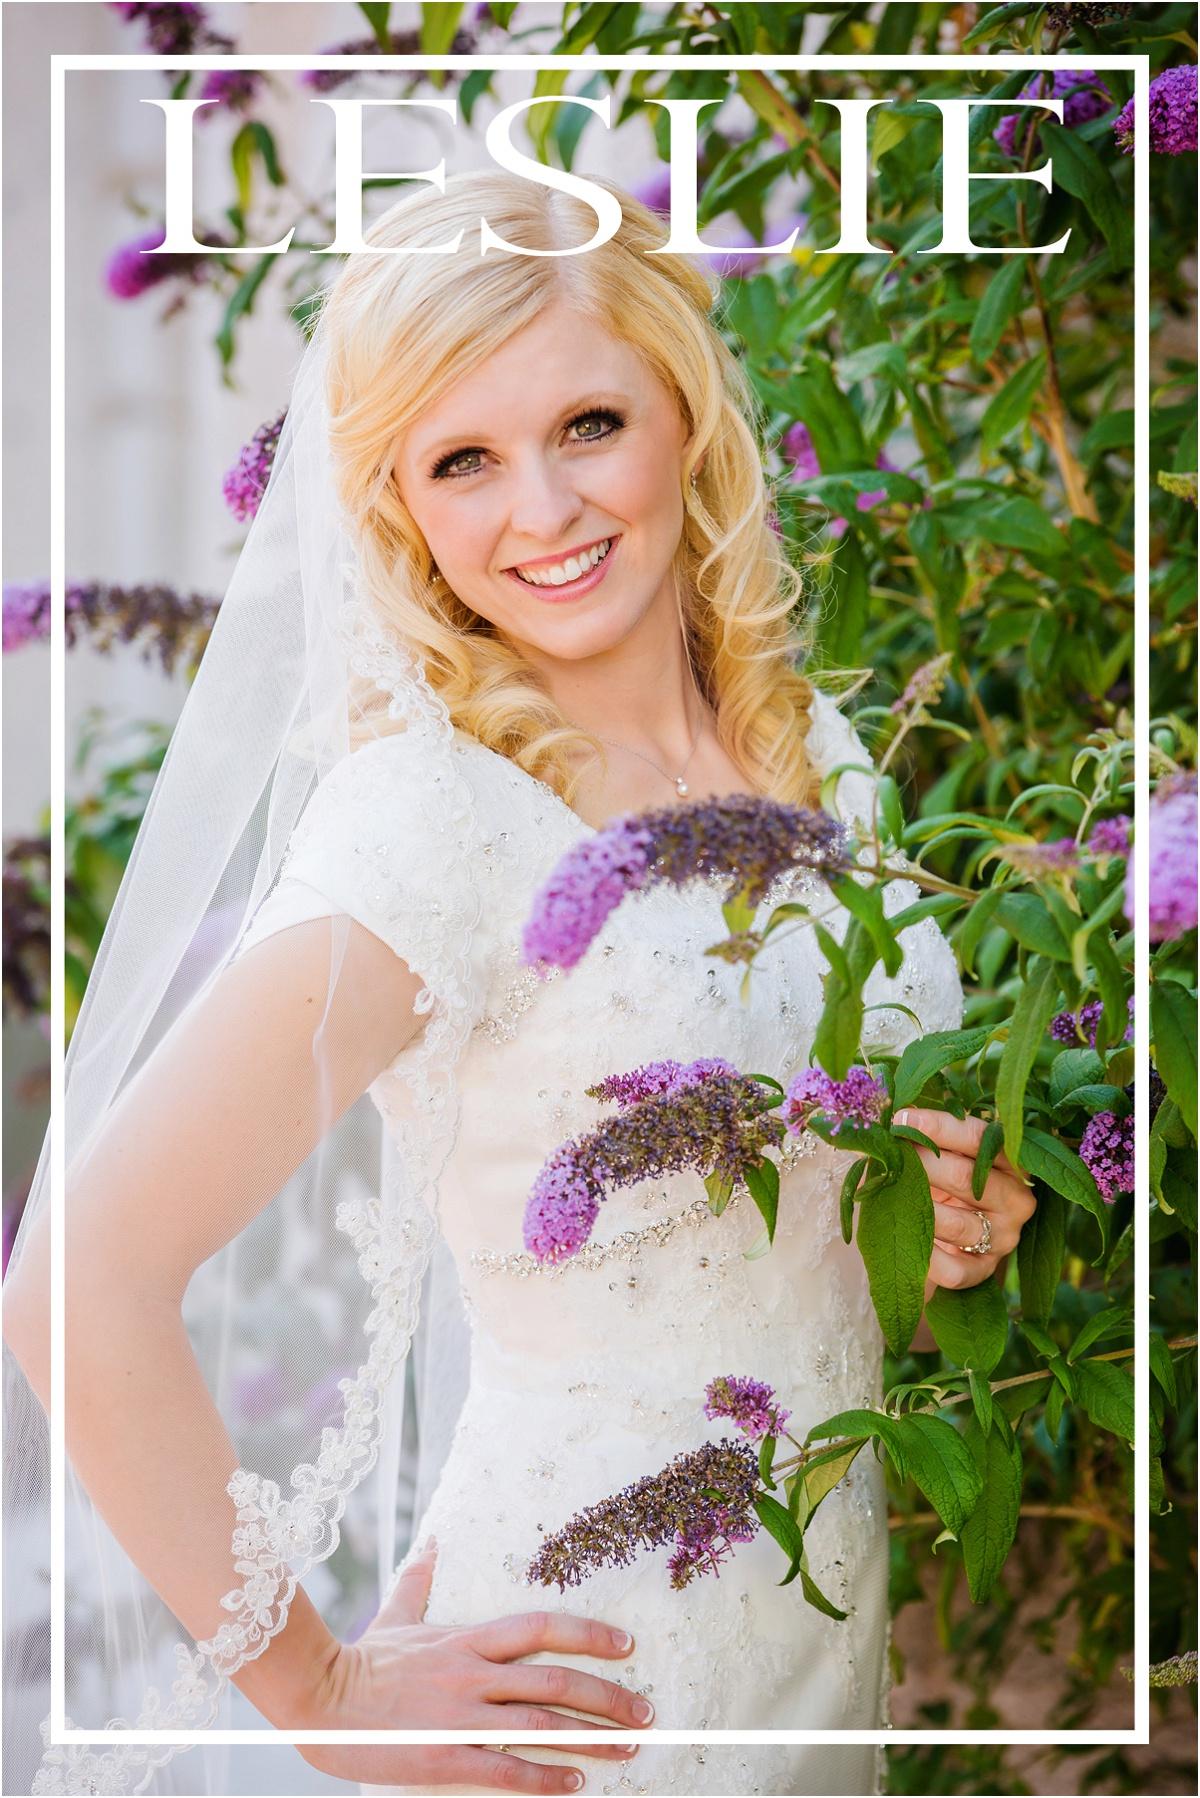 Terra Cooper Photography Weddings Brides 2015_5365.jpg